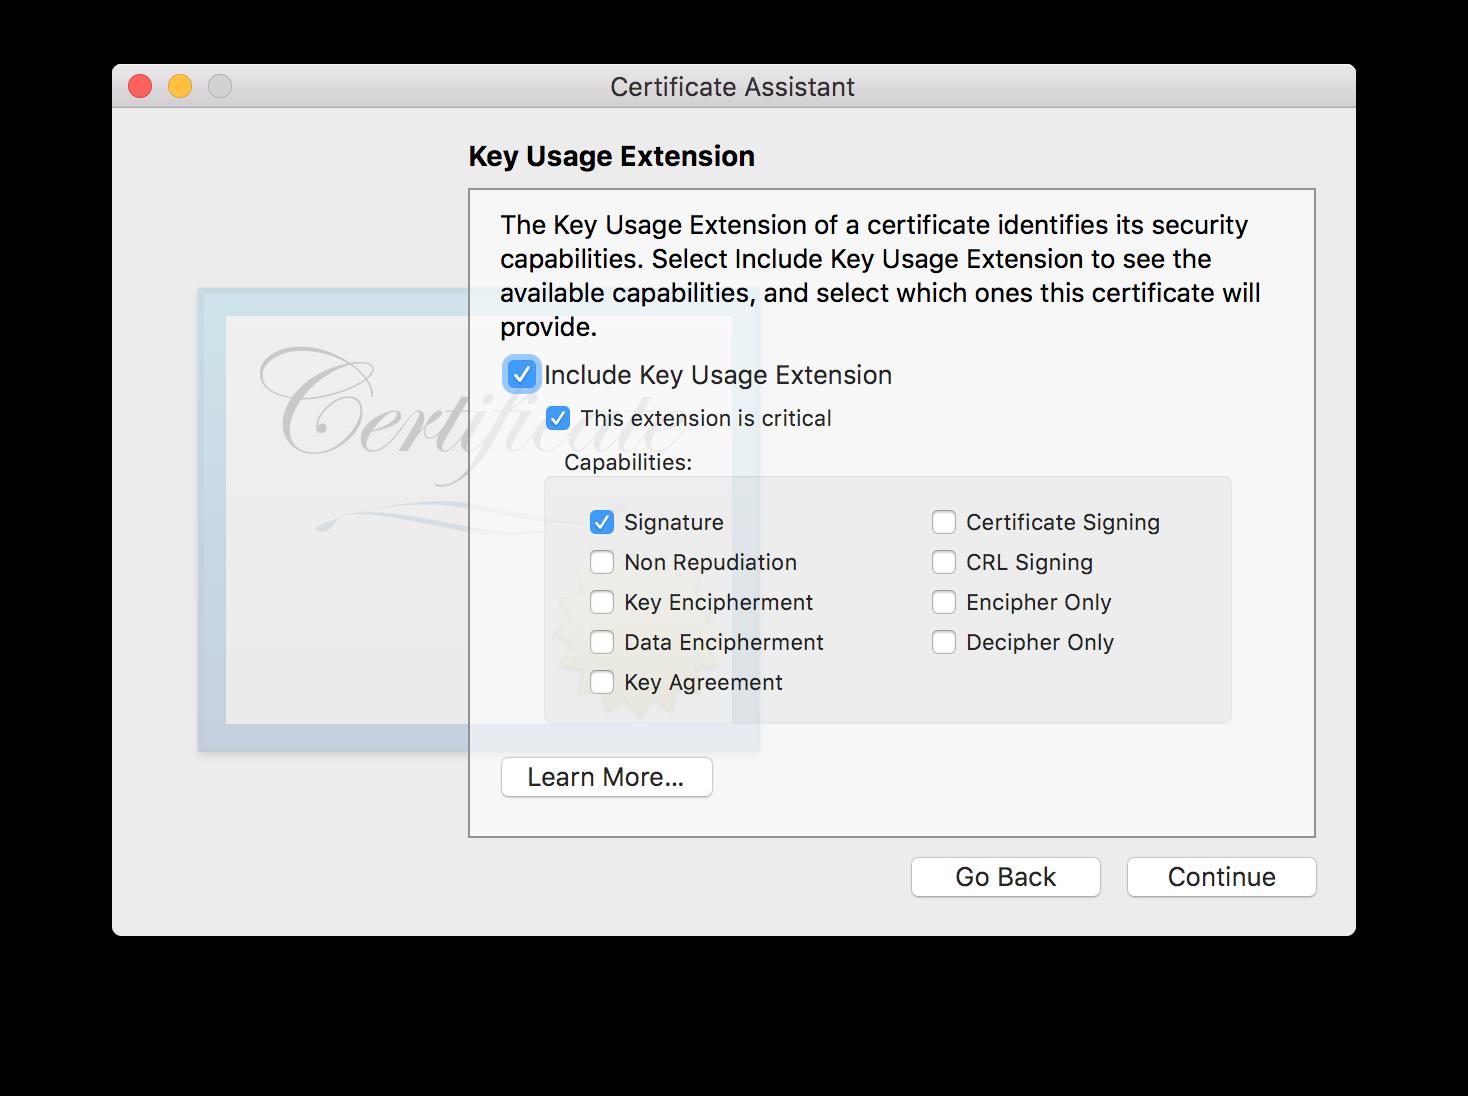 Key Usage Extension